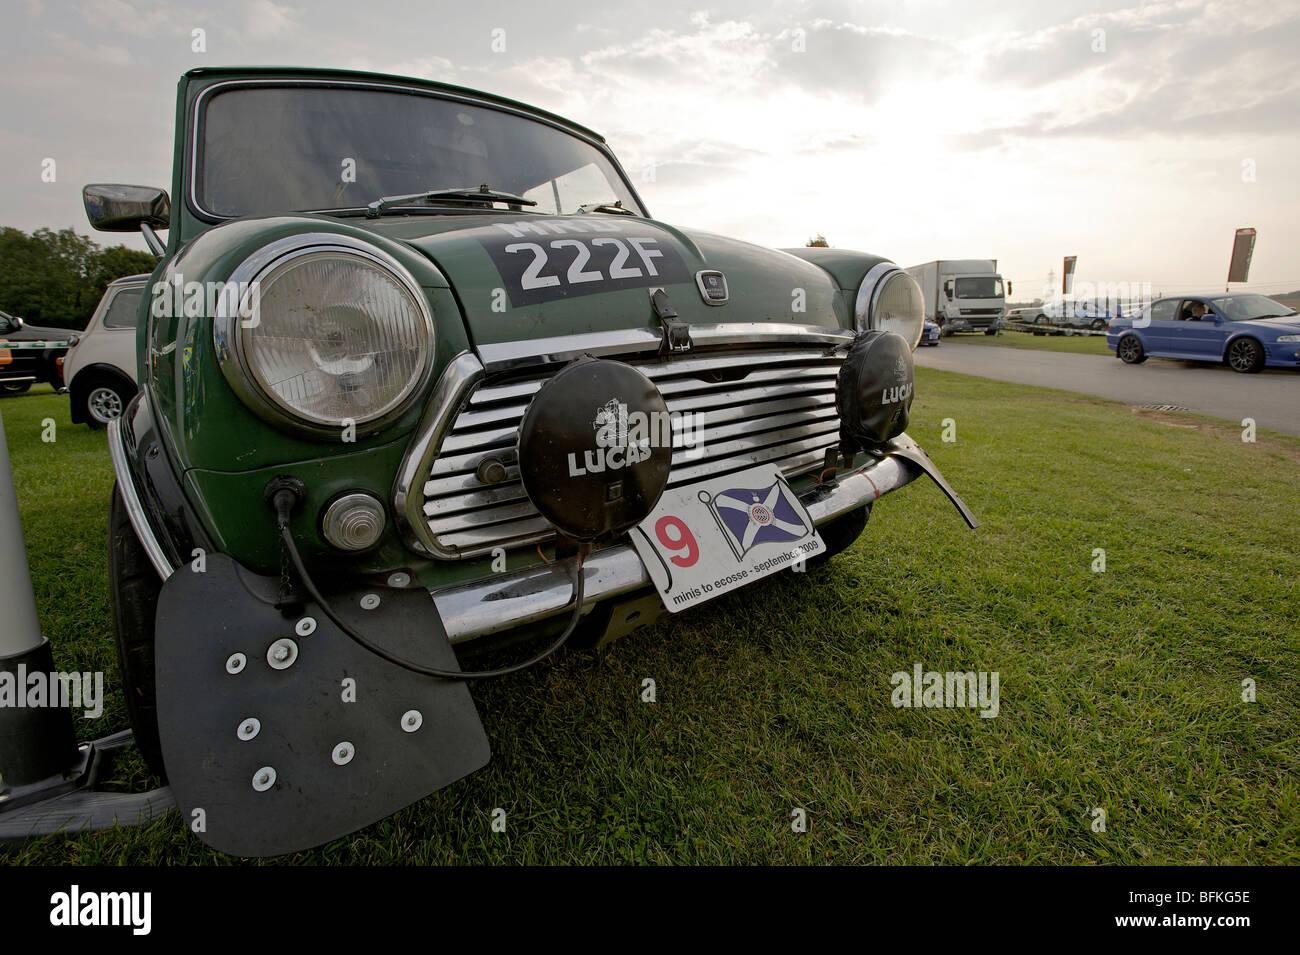 Mini Cooper - Stock Image